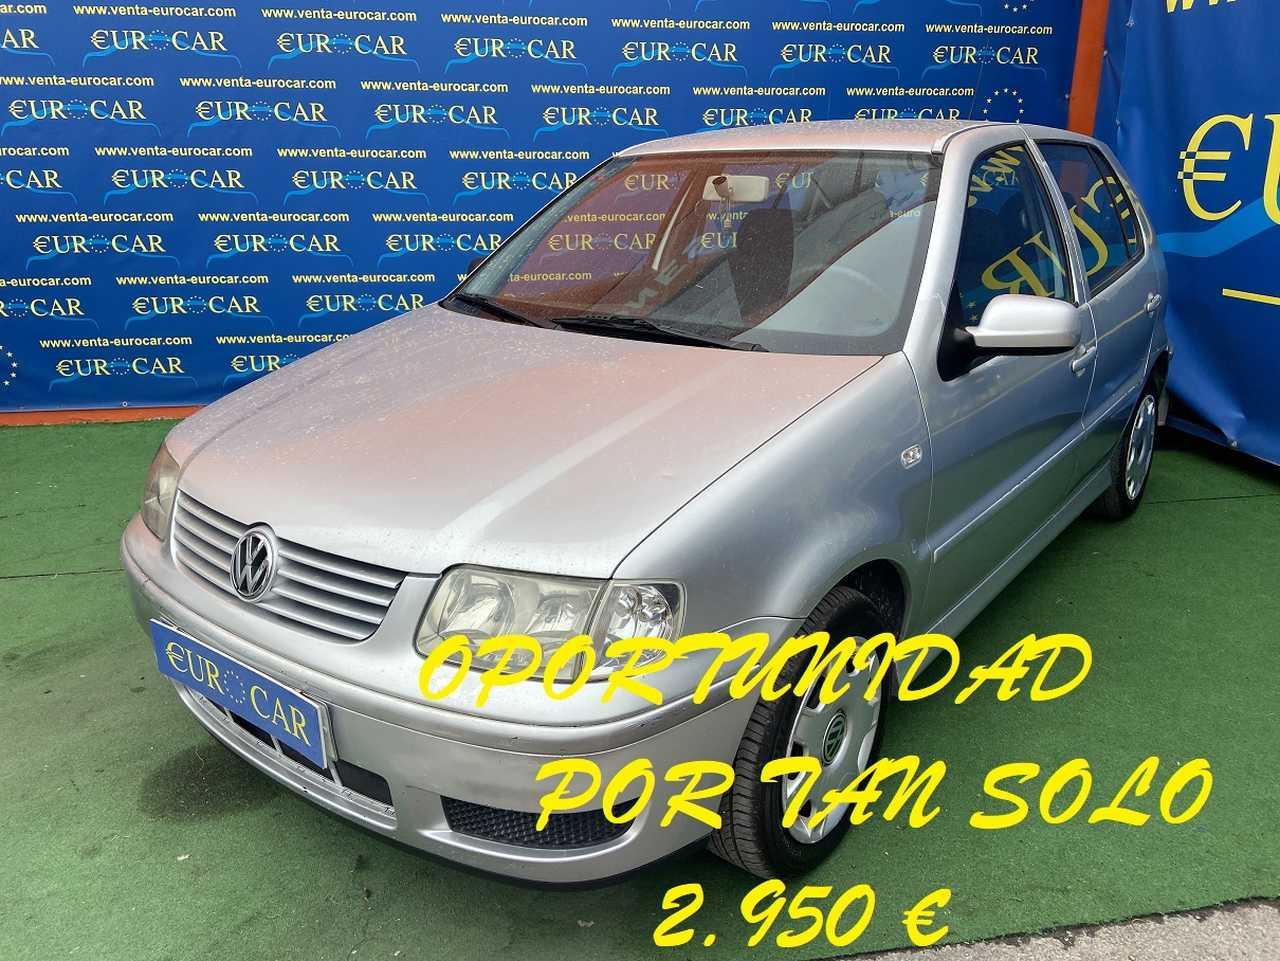 Volkswagen Polo ocasión segunda mano 2002 Diésel por 2.950€ en Alicante